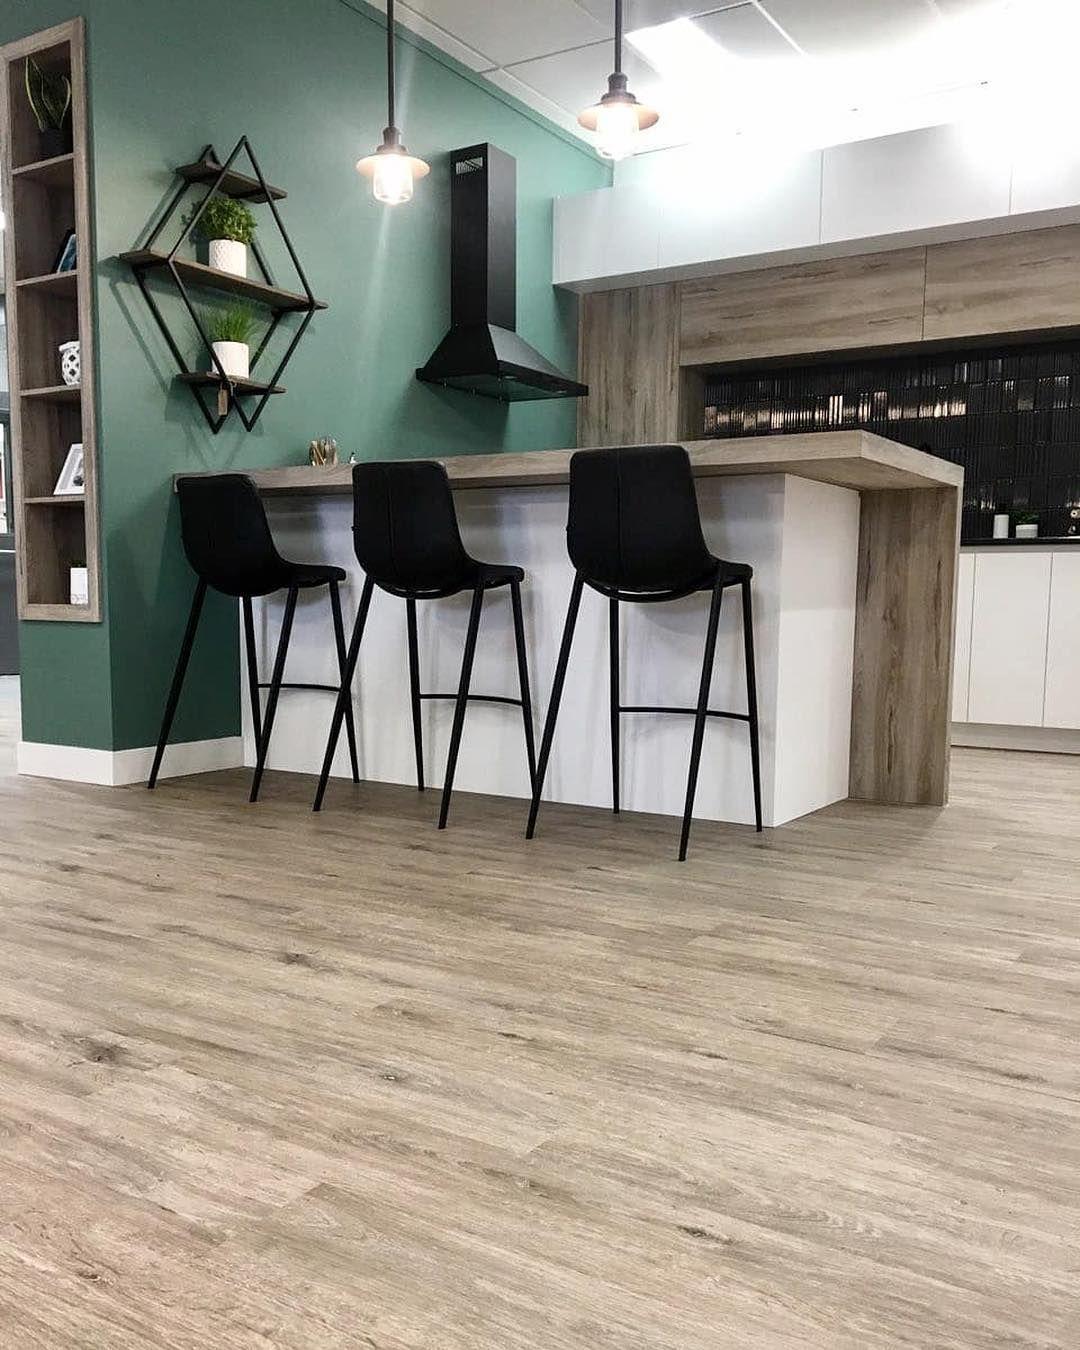 Kitchen Flooring Trends 2020.Popular Kitchen Flooring 2020 Flooring Trends 2020 In 2019